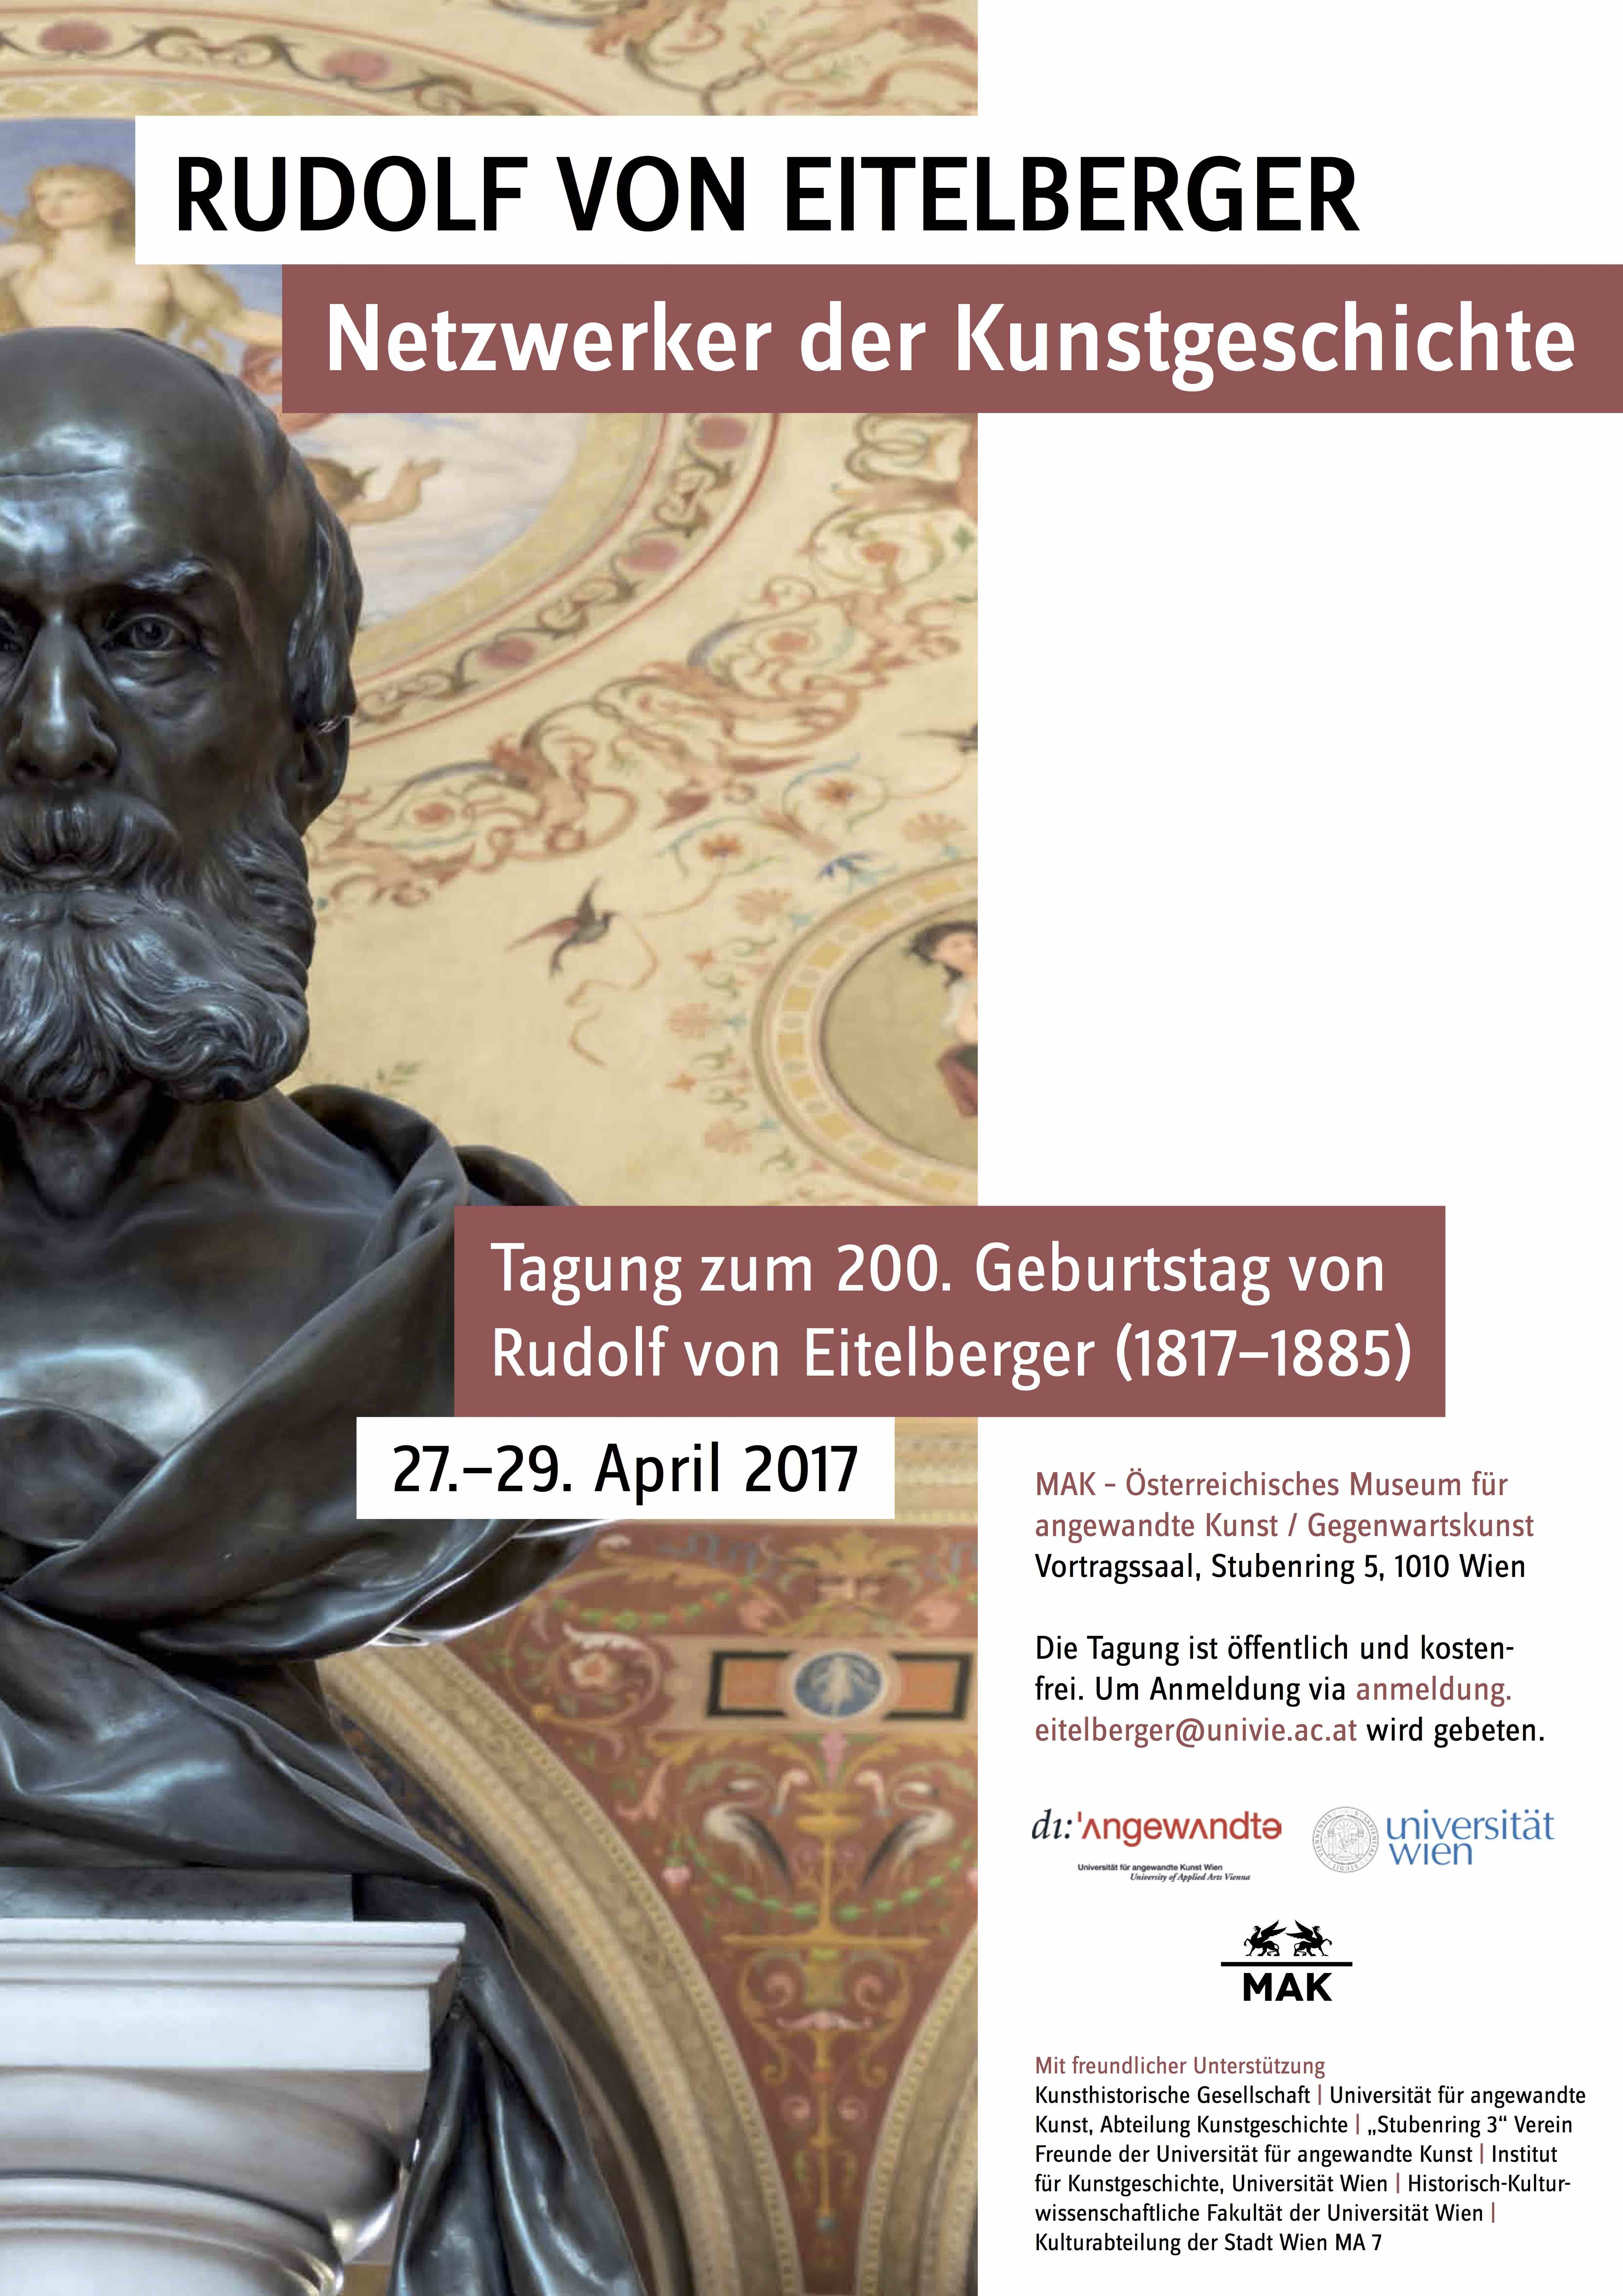 Eitelberger Plakat 2017 0406 Lq